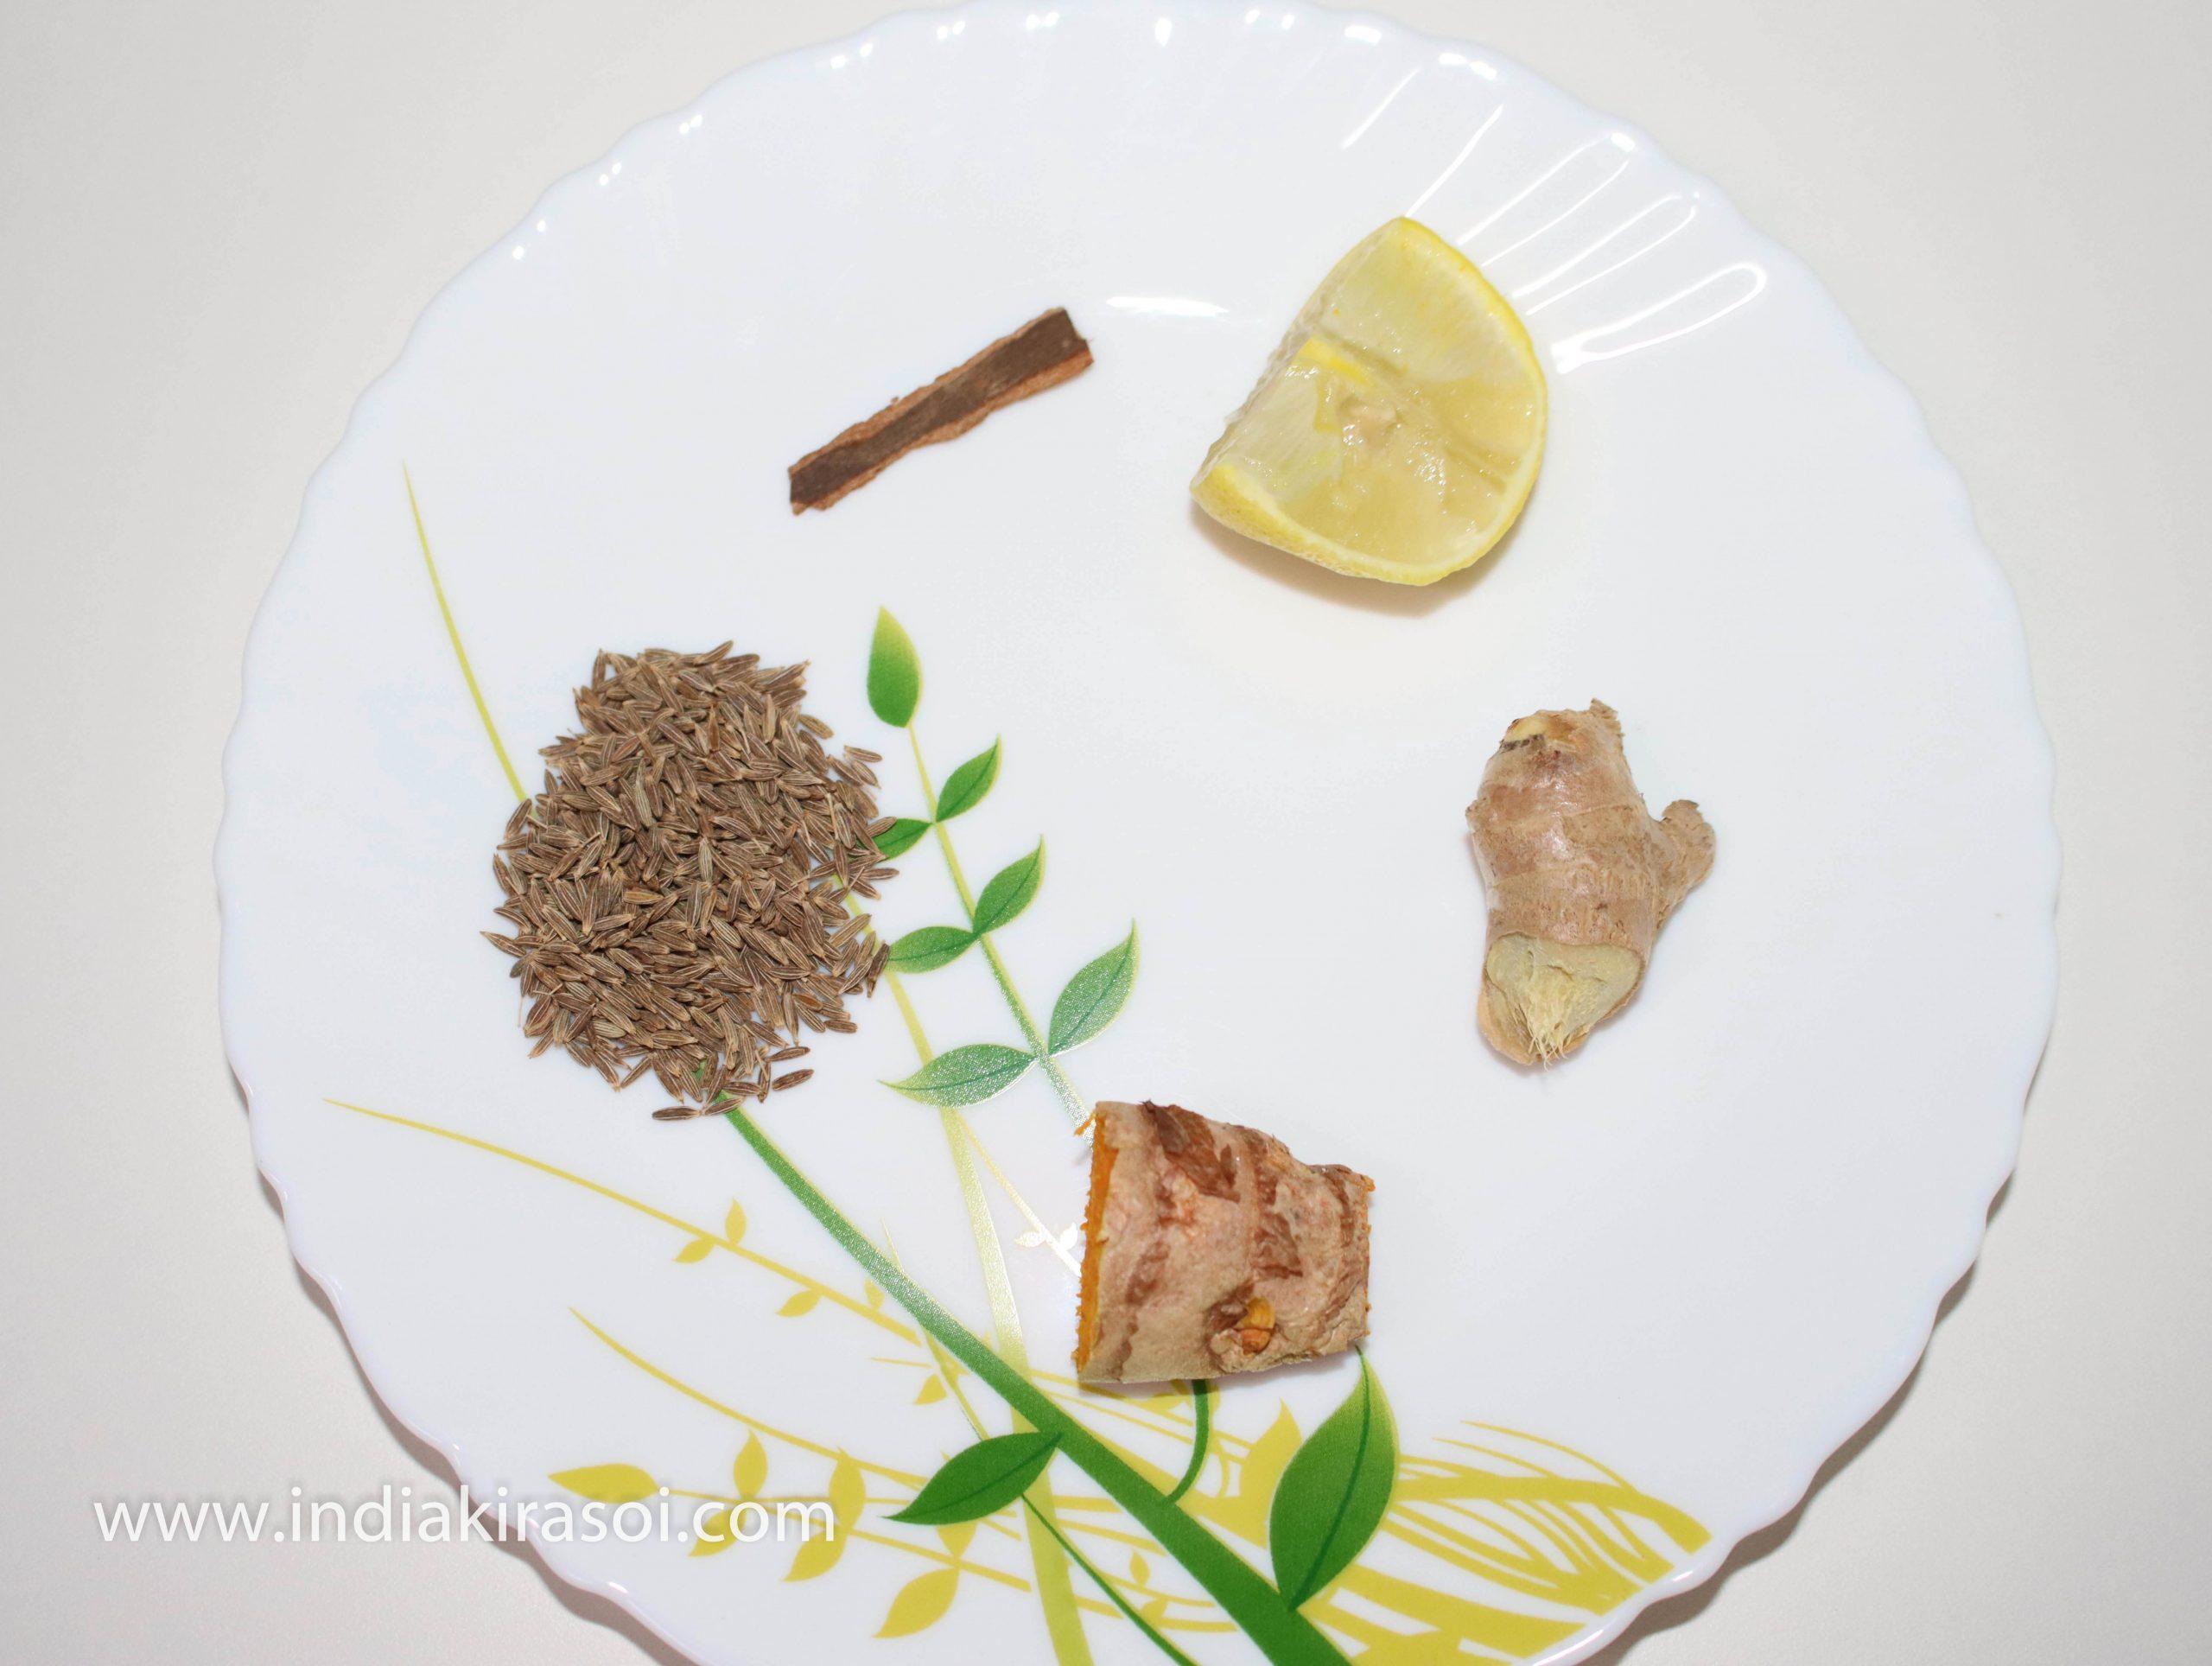 To make turmeric ginger cumin water, take 2-inch long raw turmeric, take one-inch long ginger, 2 teaspoon cumin, 2-inch long cinnamon, and half lemon.